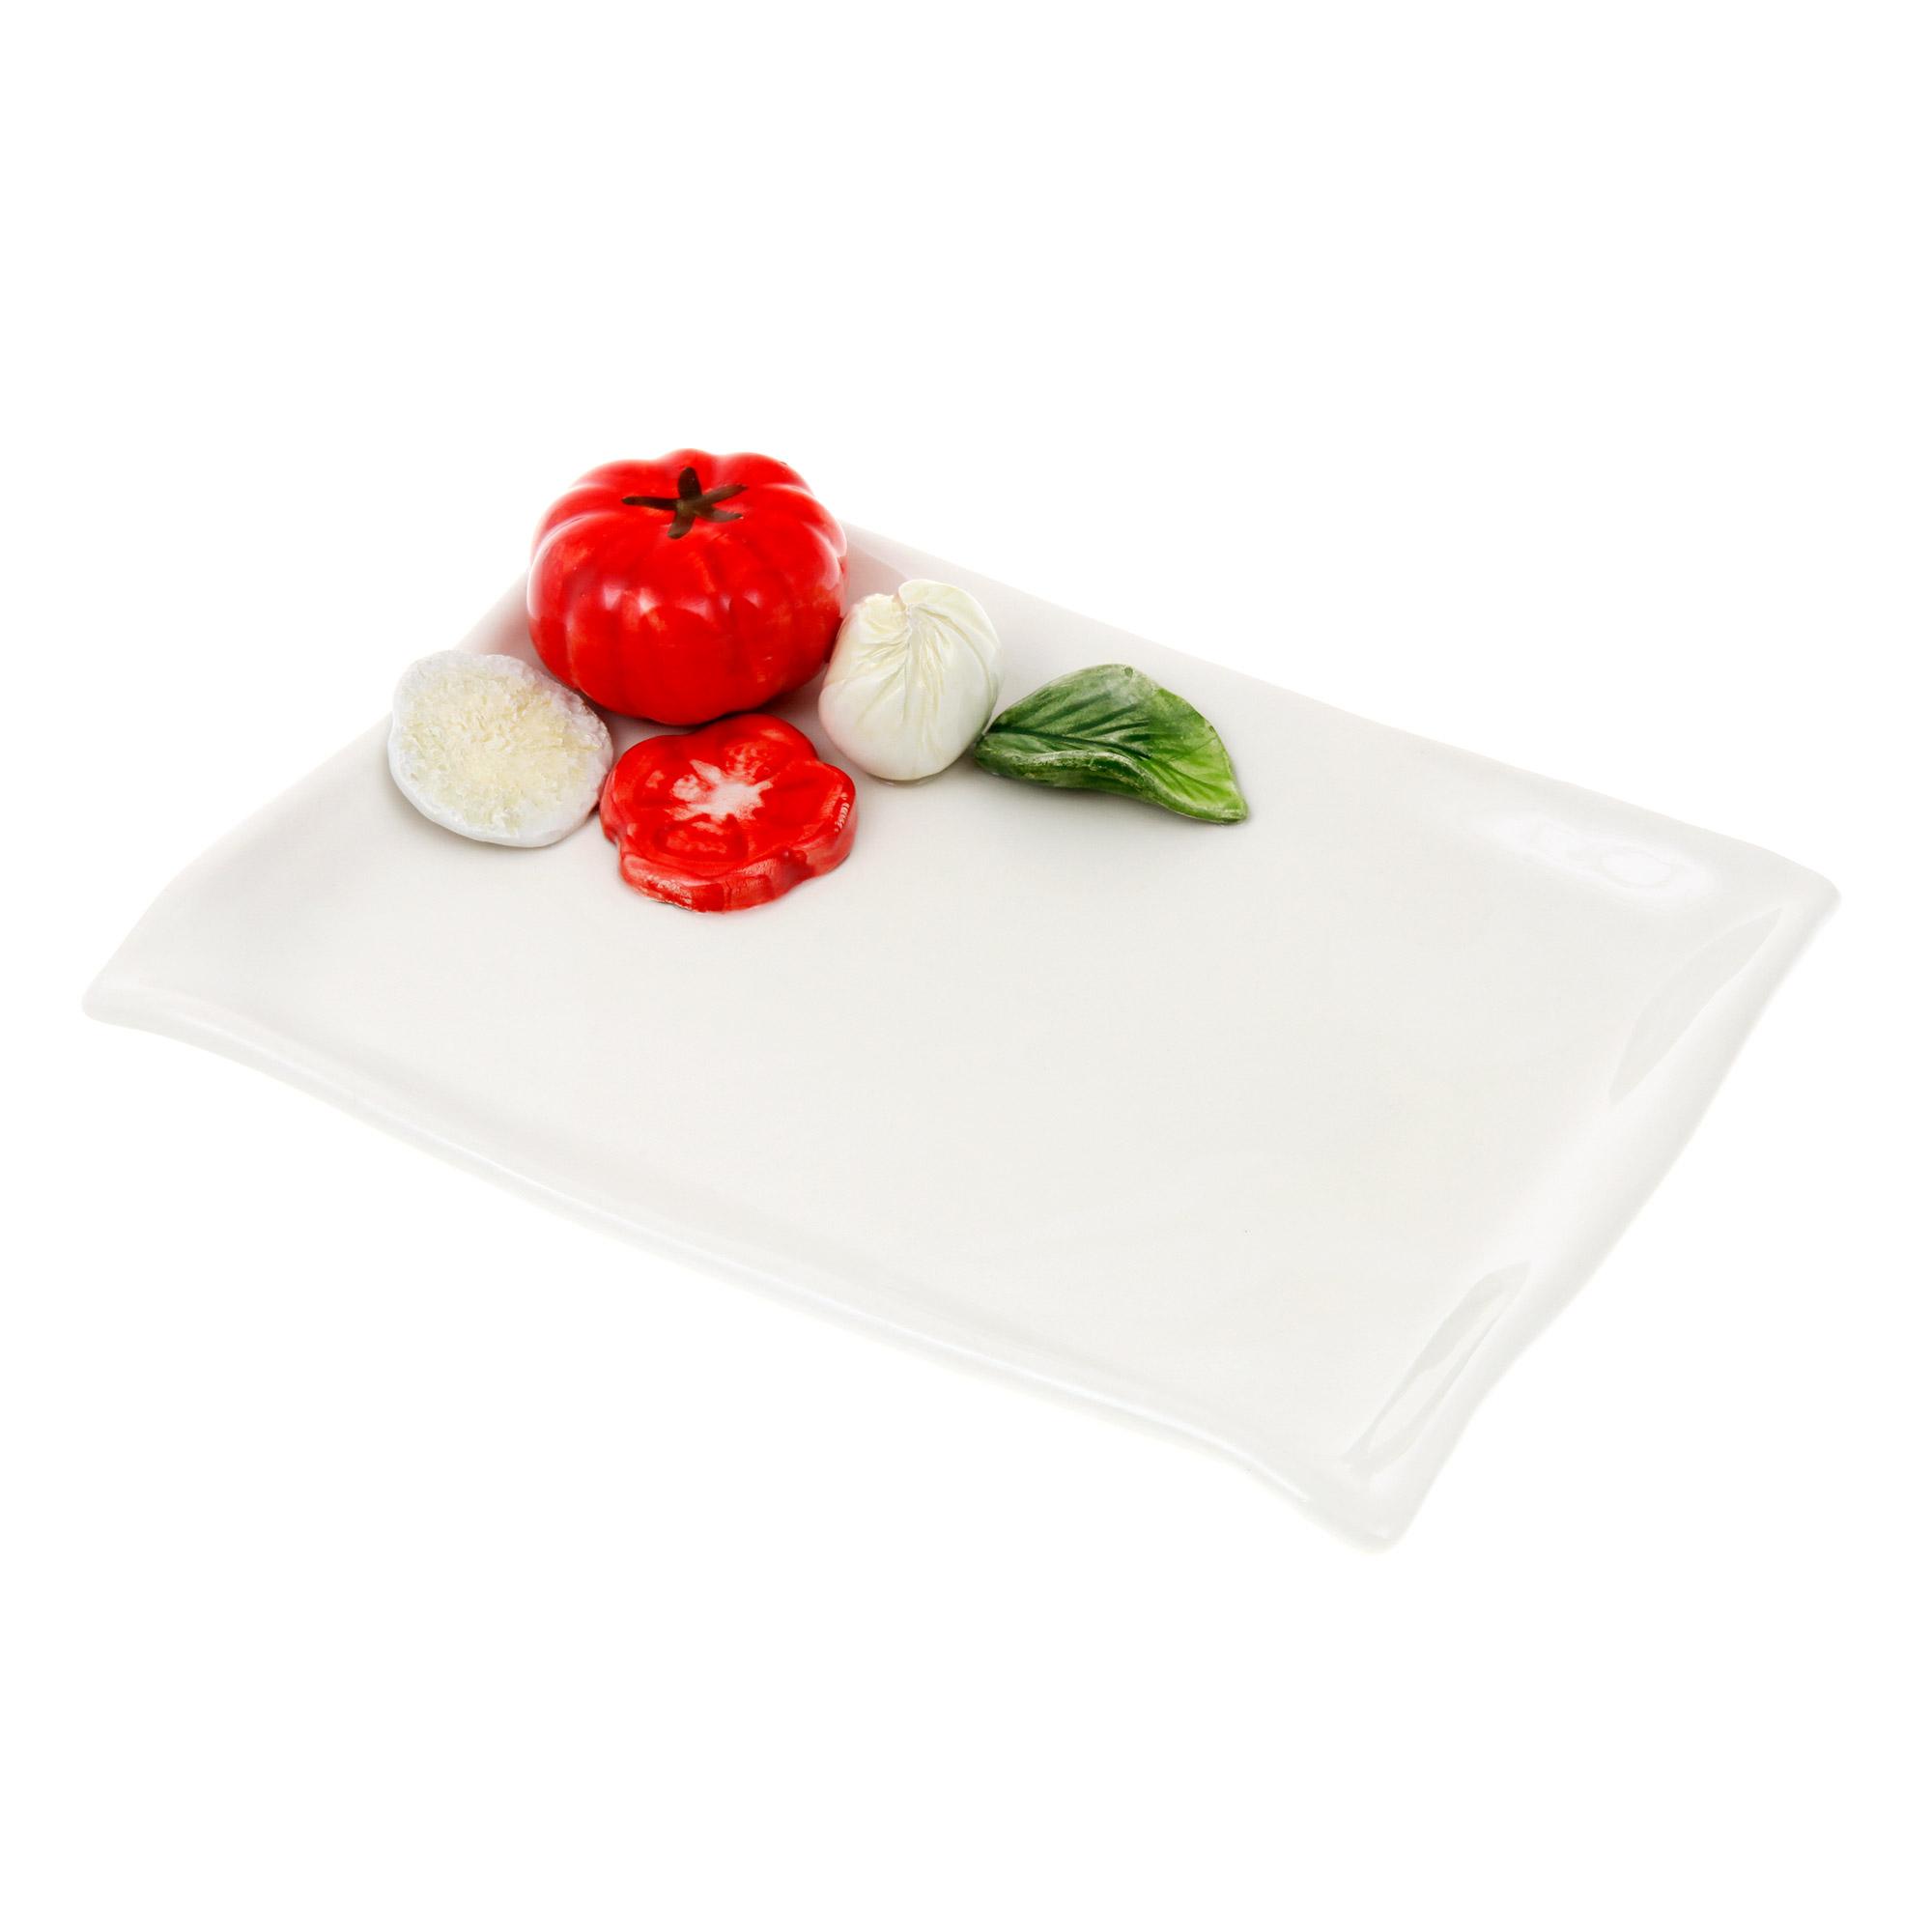 Блюдо сервировочное Annaluma Mozzarella 25x16см фото